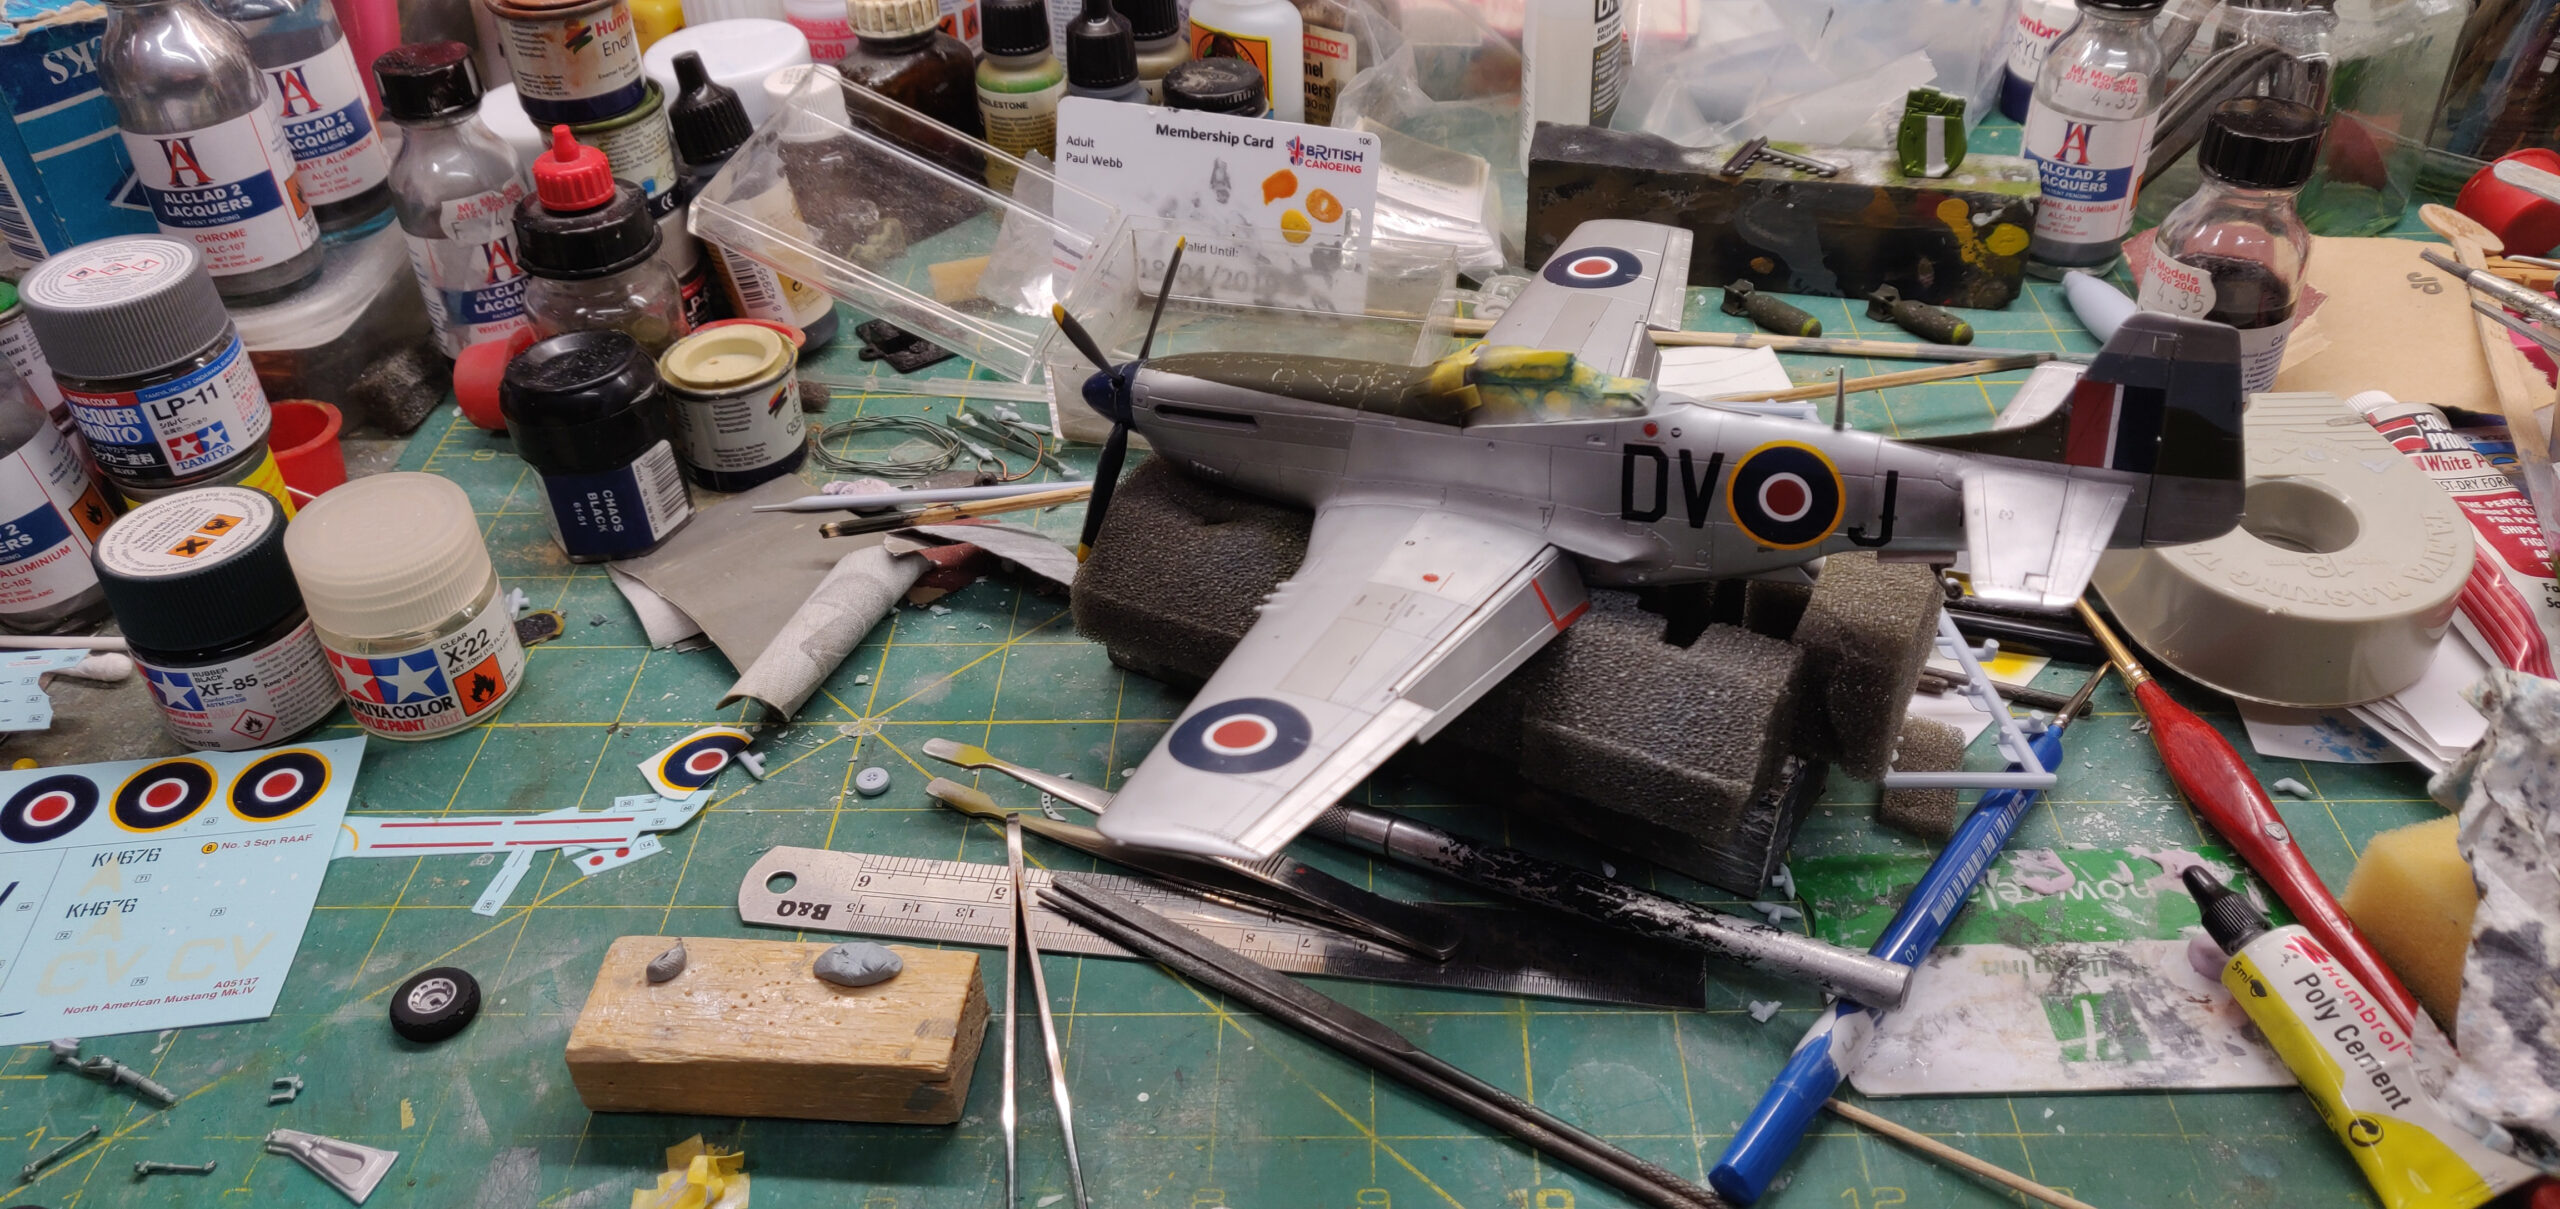 P-51K Mustang Mk IVa RAF in 1/48 scale work in progress.